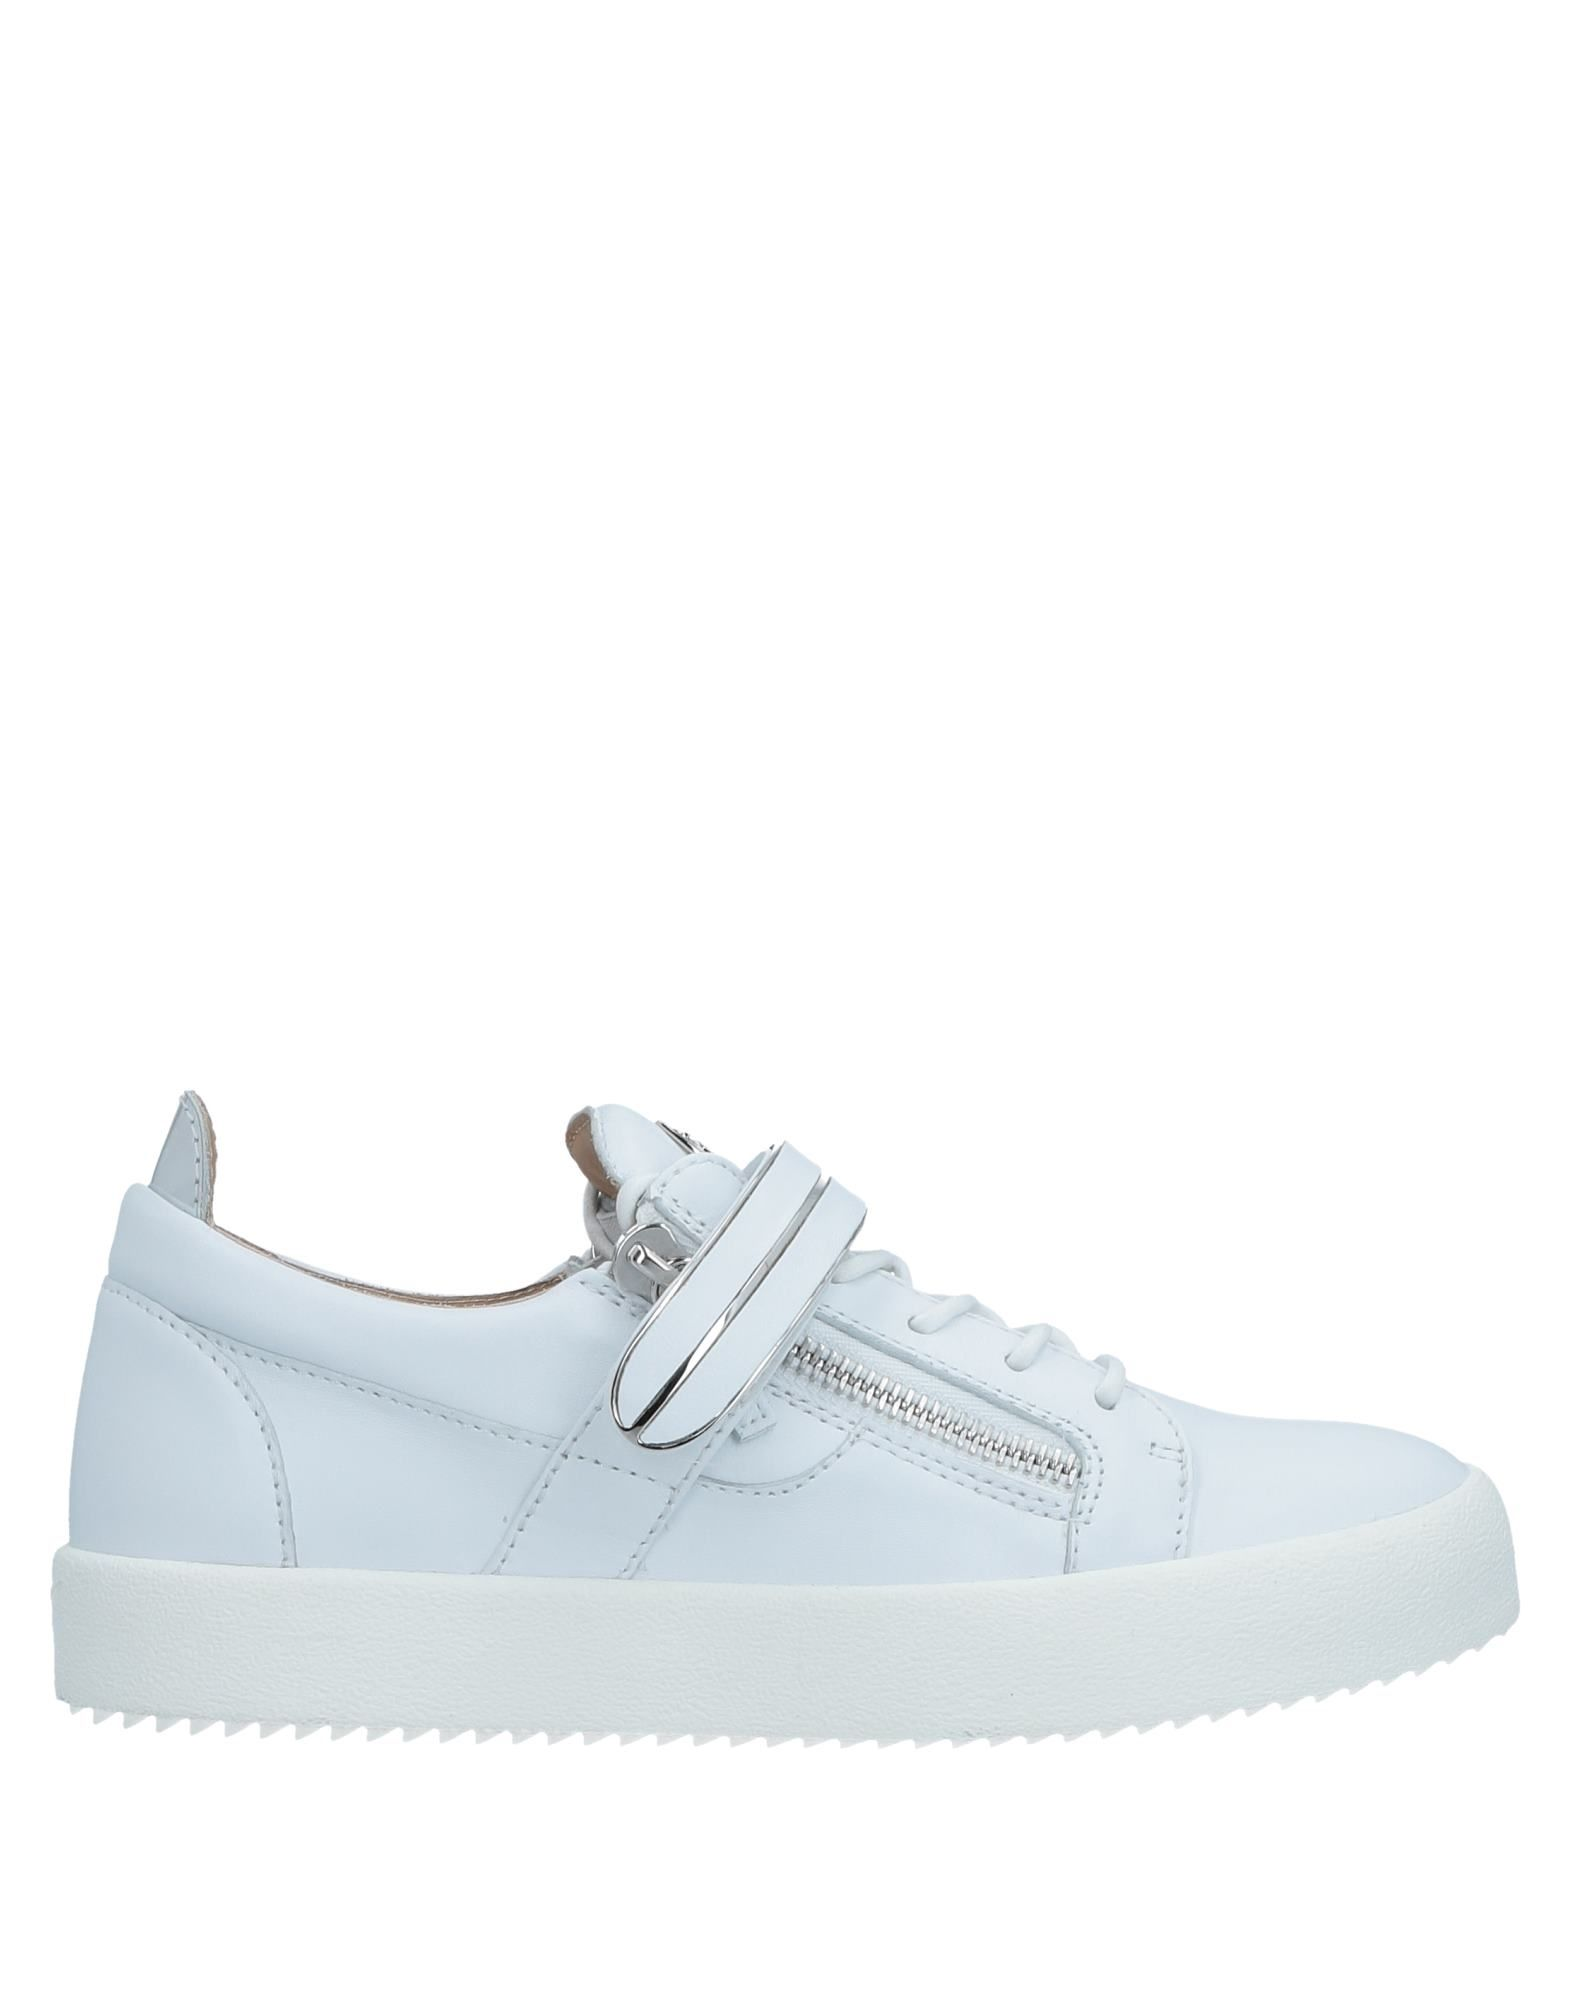 Giuseppe Zanotti Sneakers Herren  11517746PB Gute Qualität beliebte Schuhe